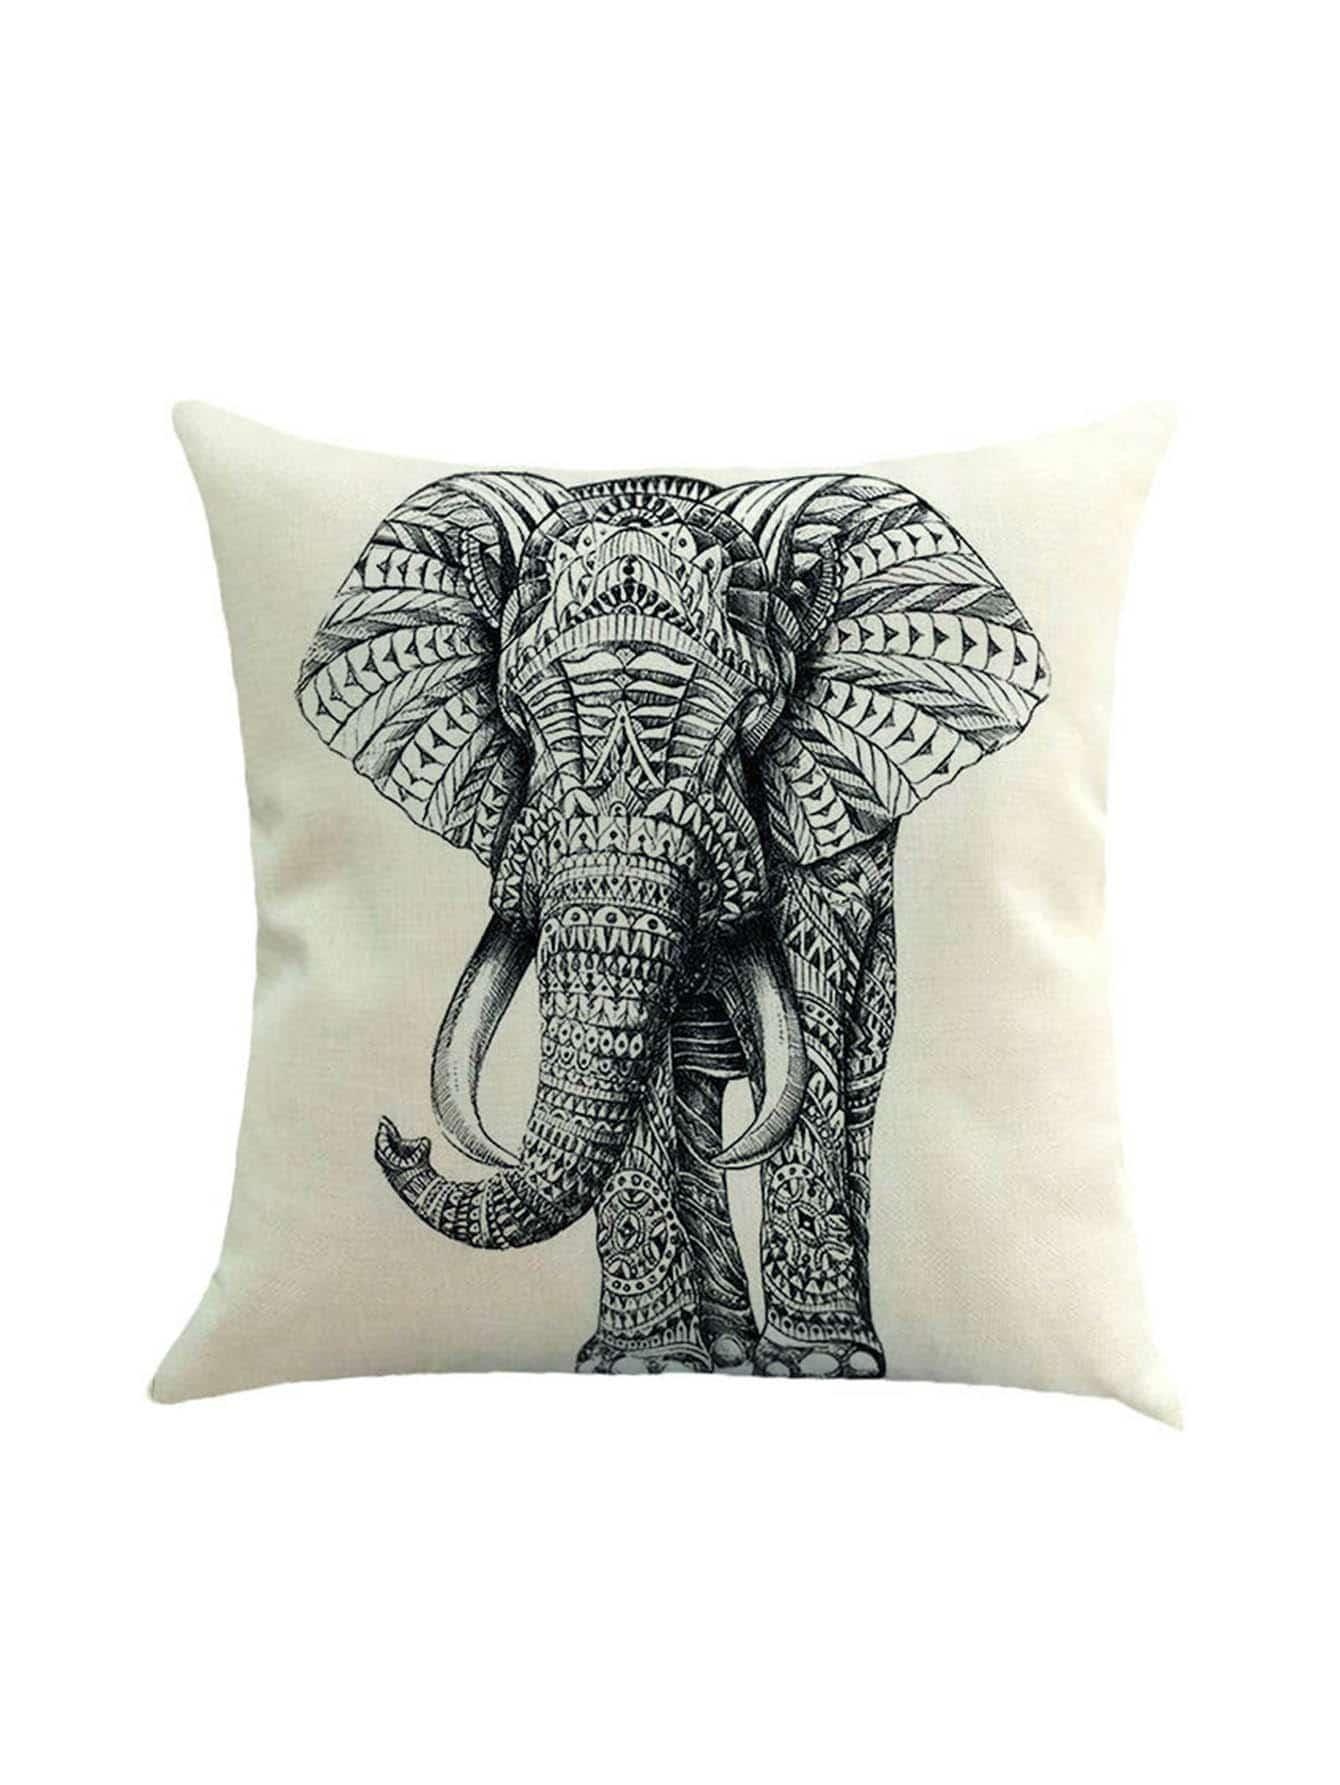 Elephant Print Pillowcase Cover